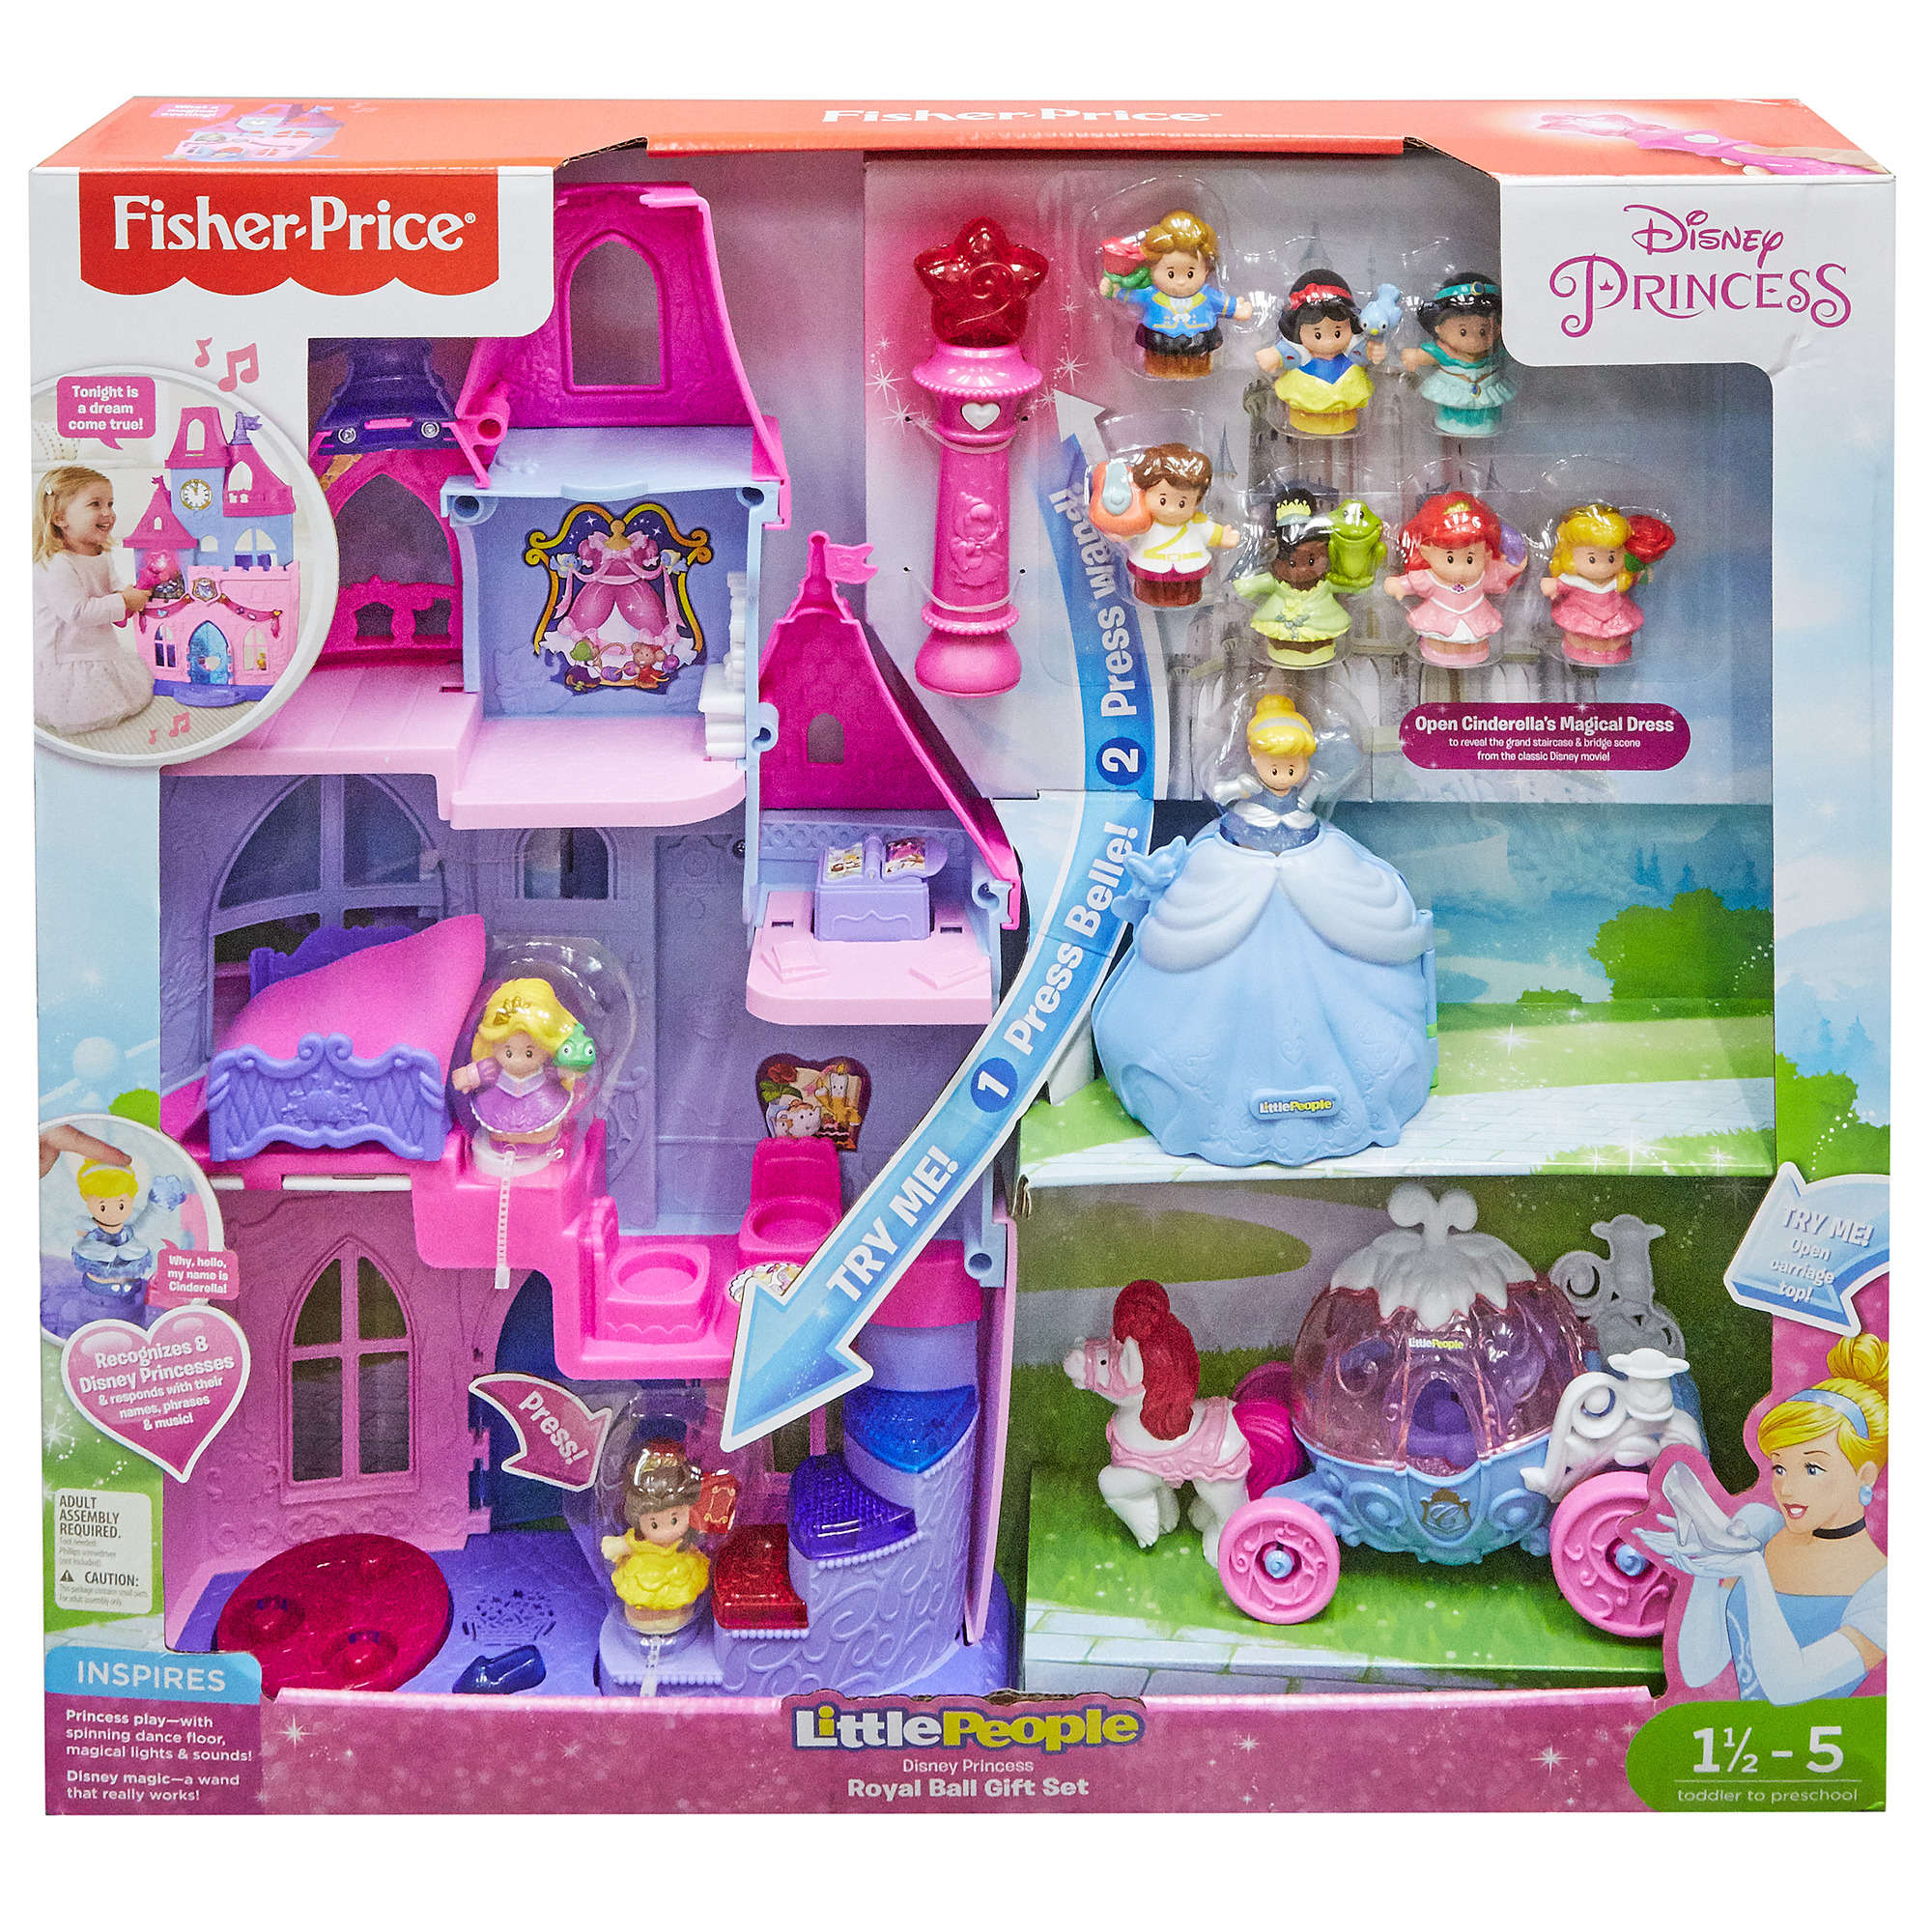 e0ee60554c5ff Disney Princess Royal Ball Gift Set by Little People - Walmart.com